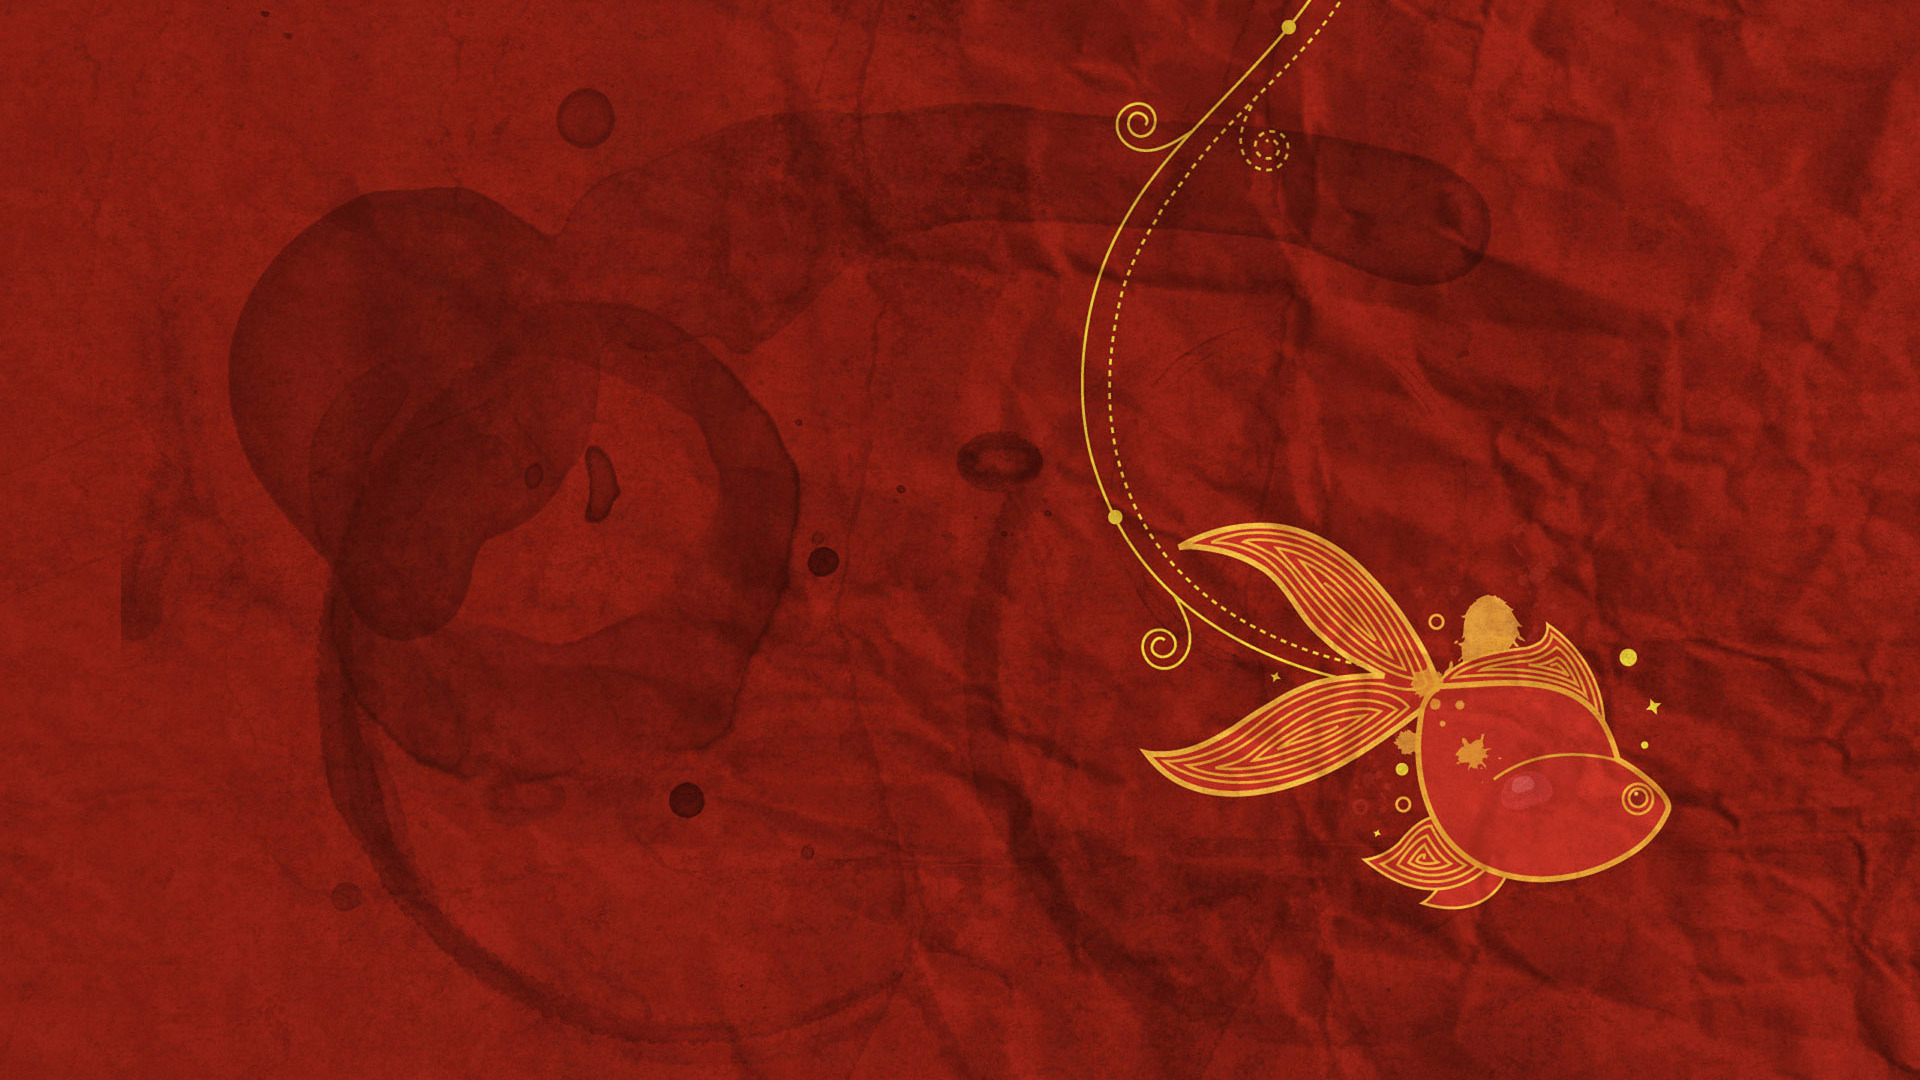 Goldfish wallpaper 1920x1080